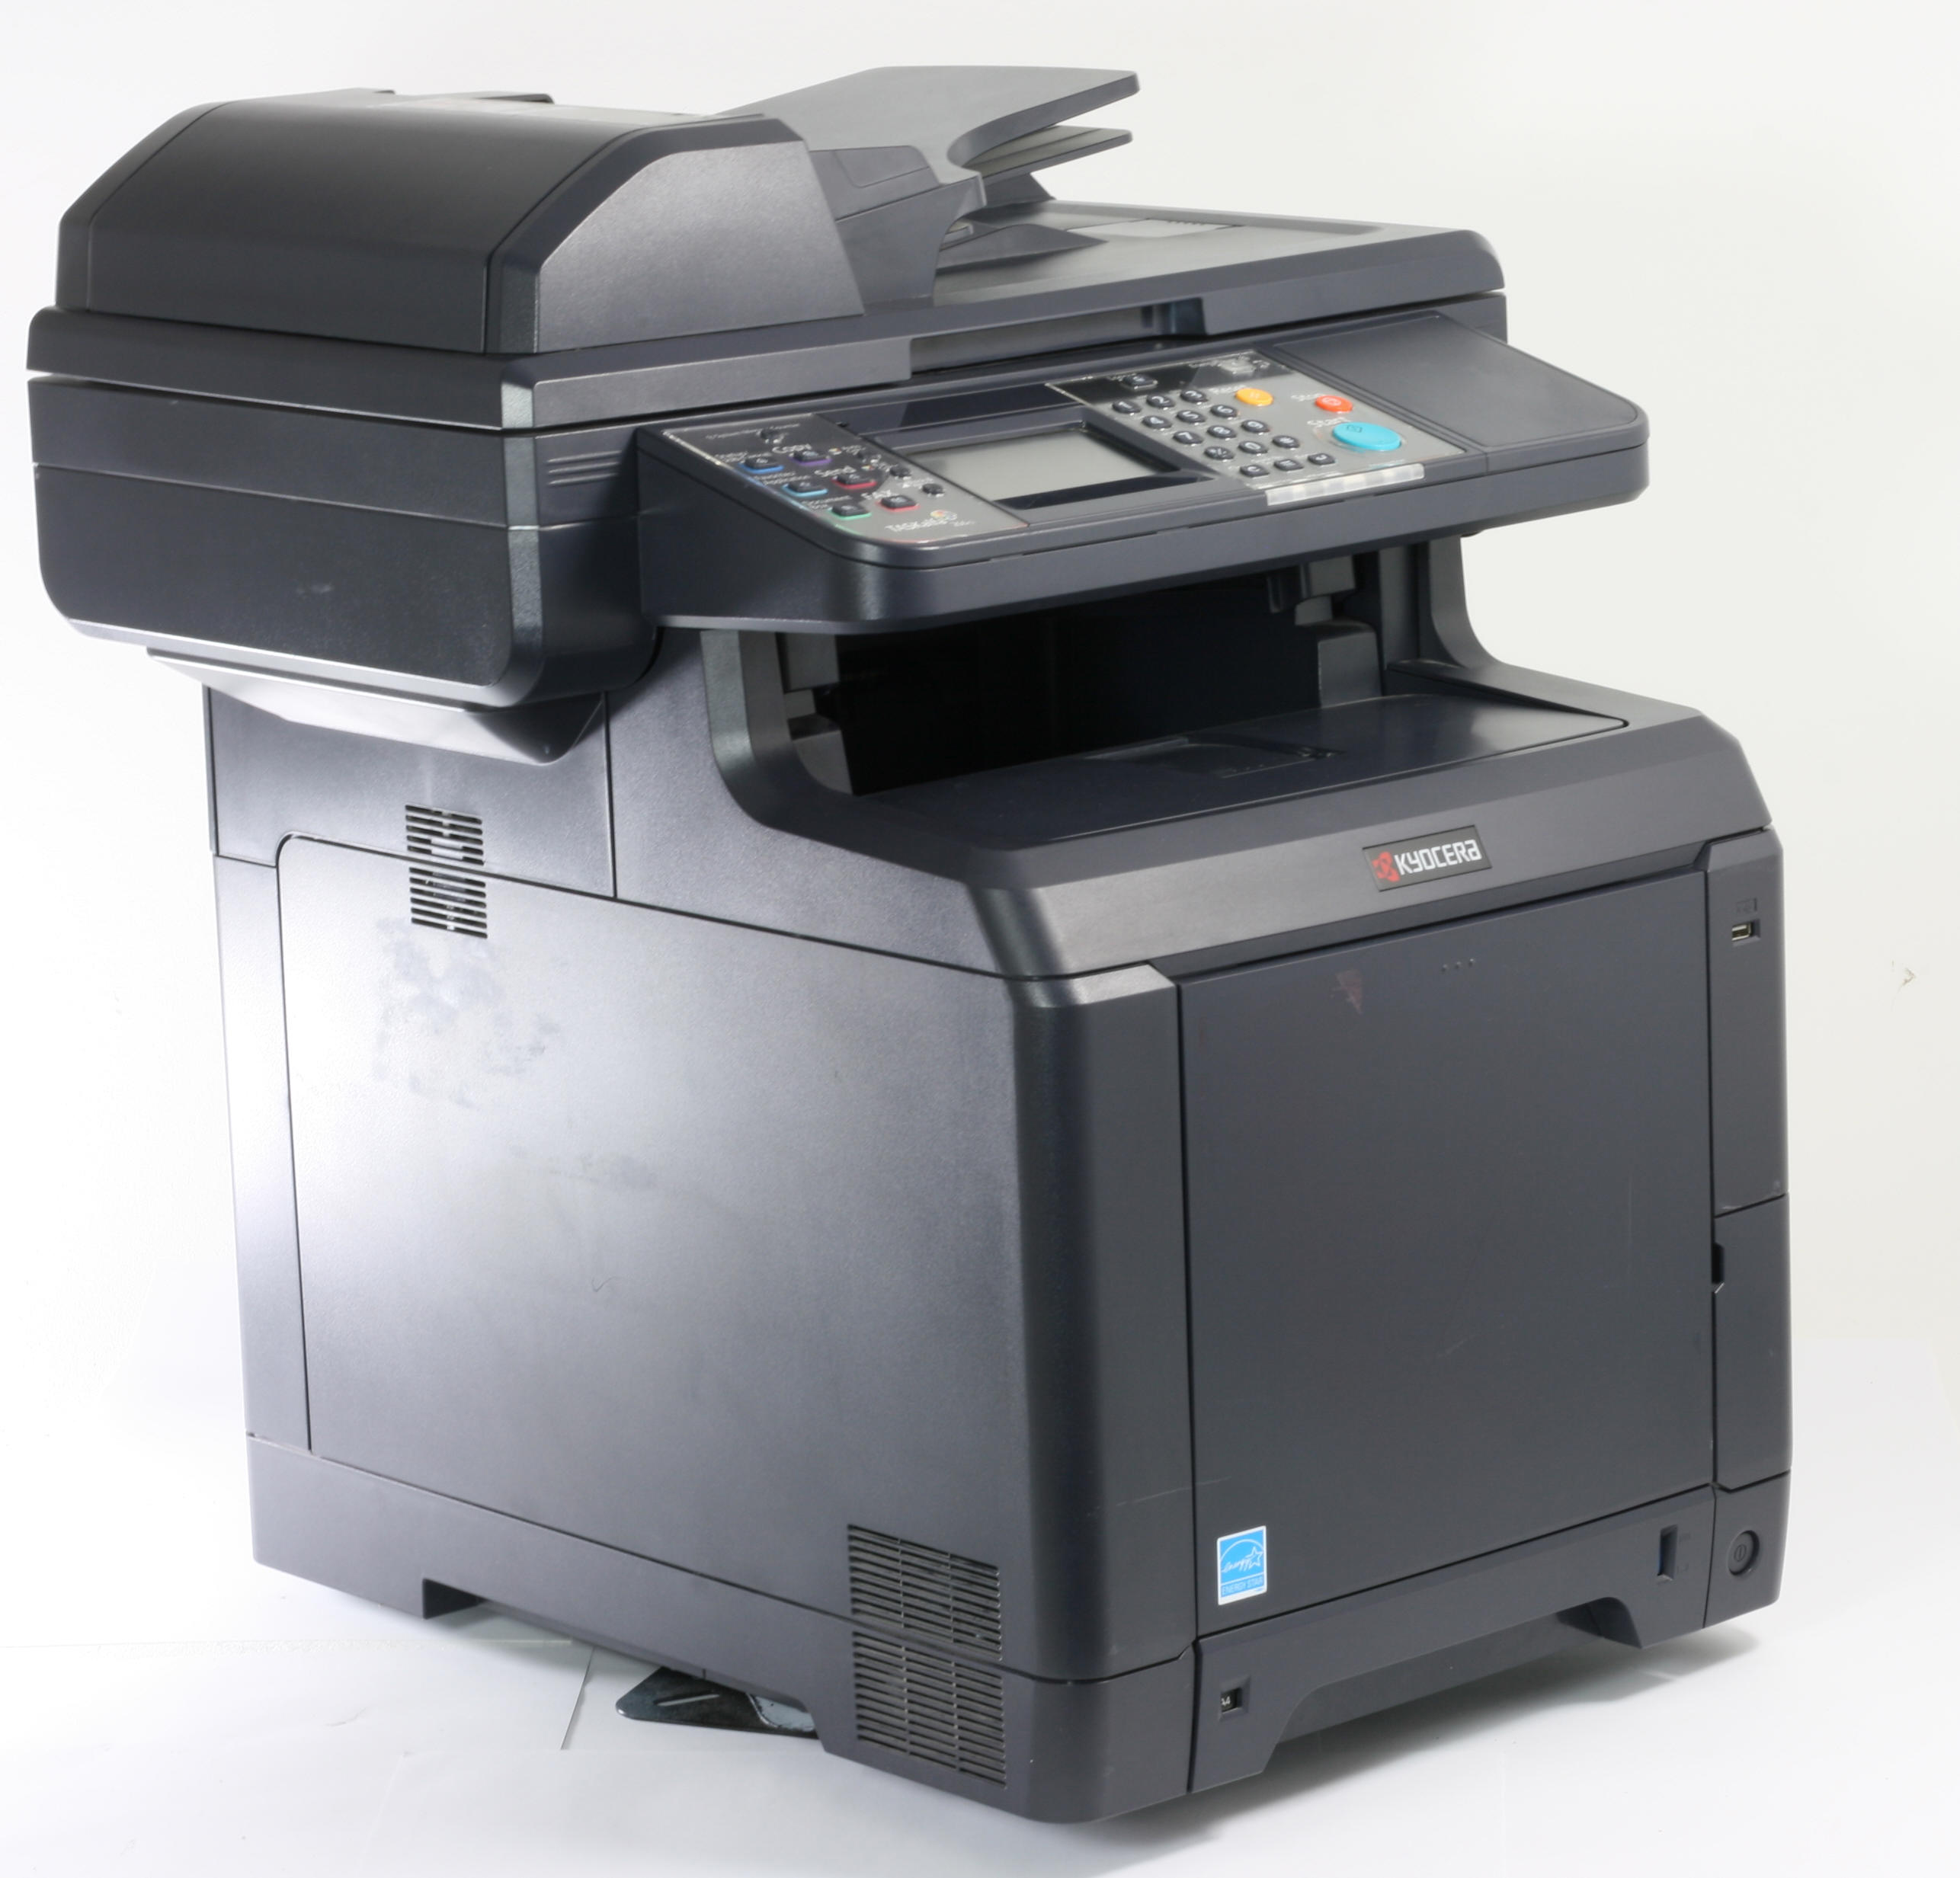 Kyocera Taskalfa 266ci MFP Drucker Laserdrucker Kopierer Scanner Fax Color gebraucht /  77180